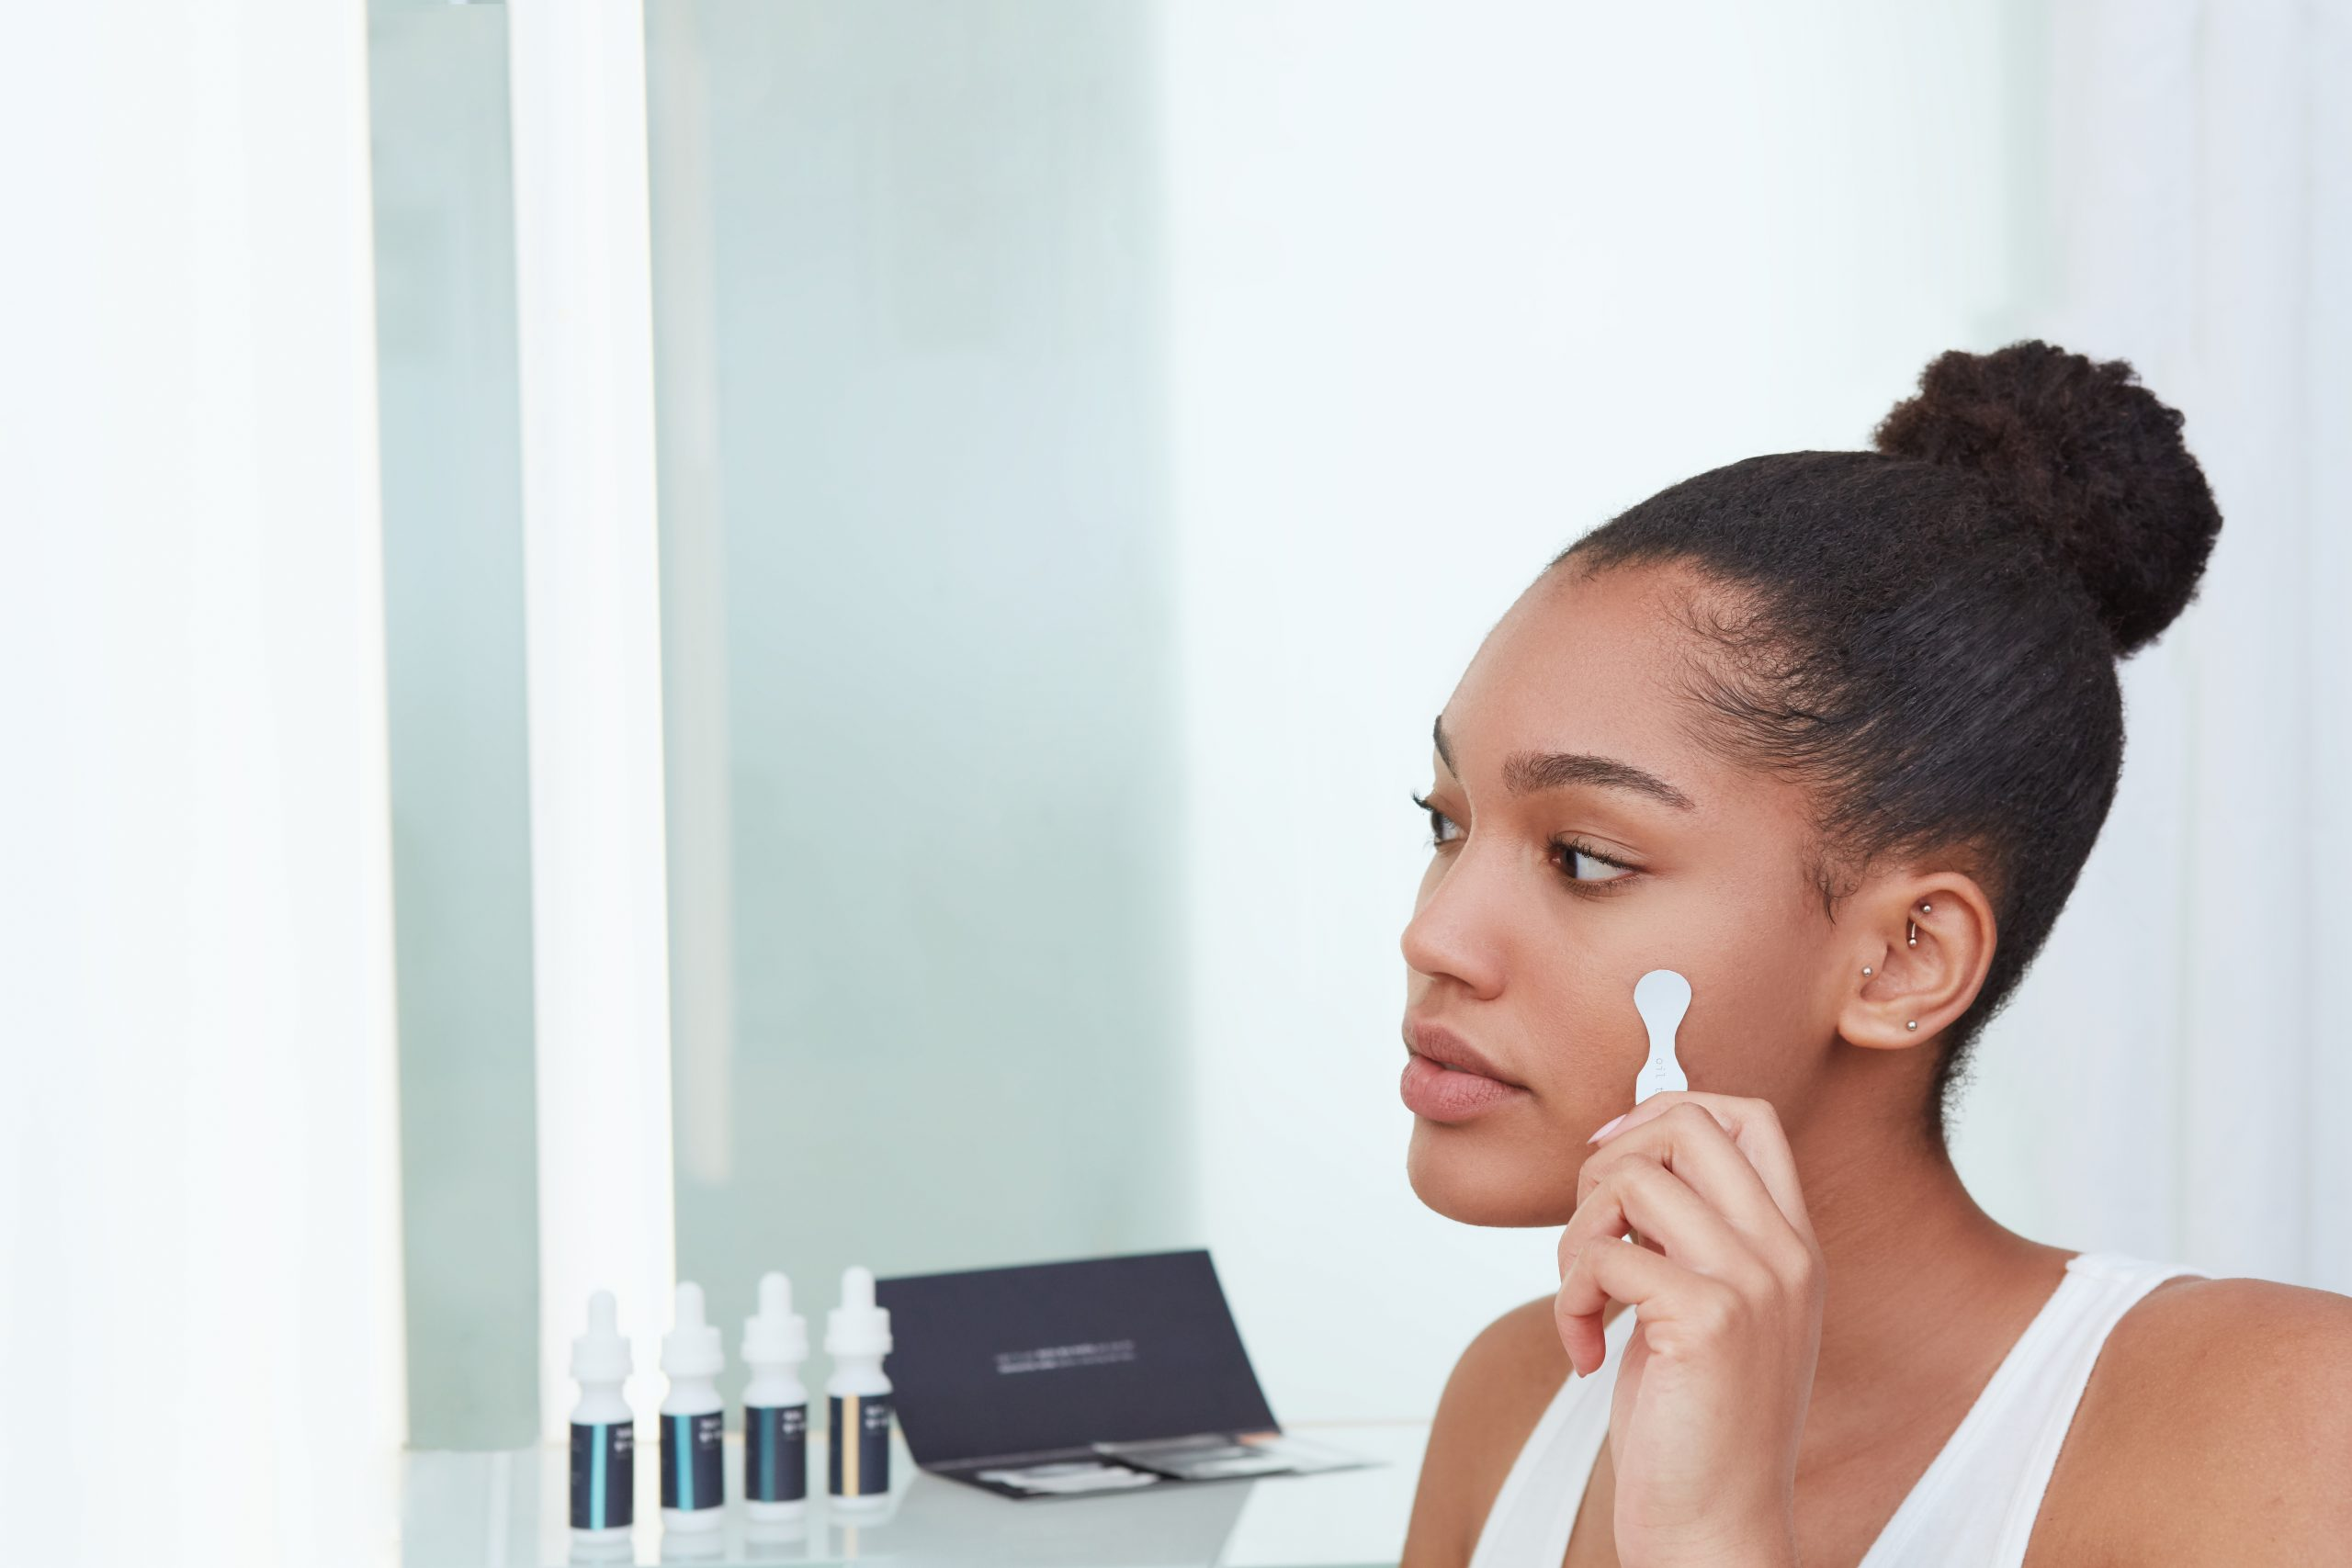 Atolla Skin Analysis